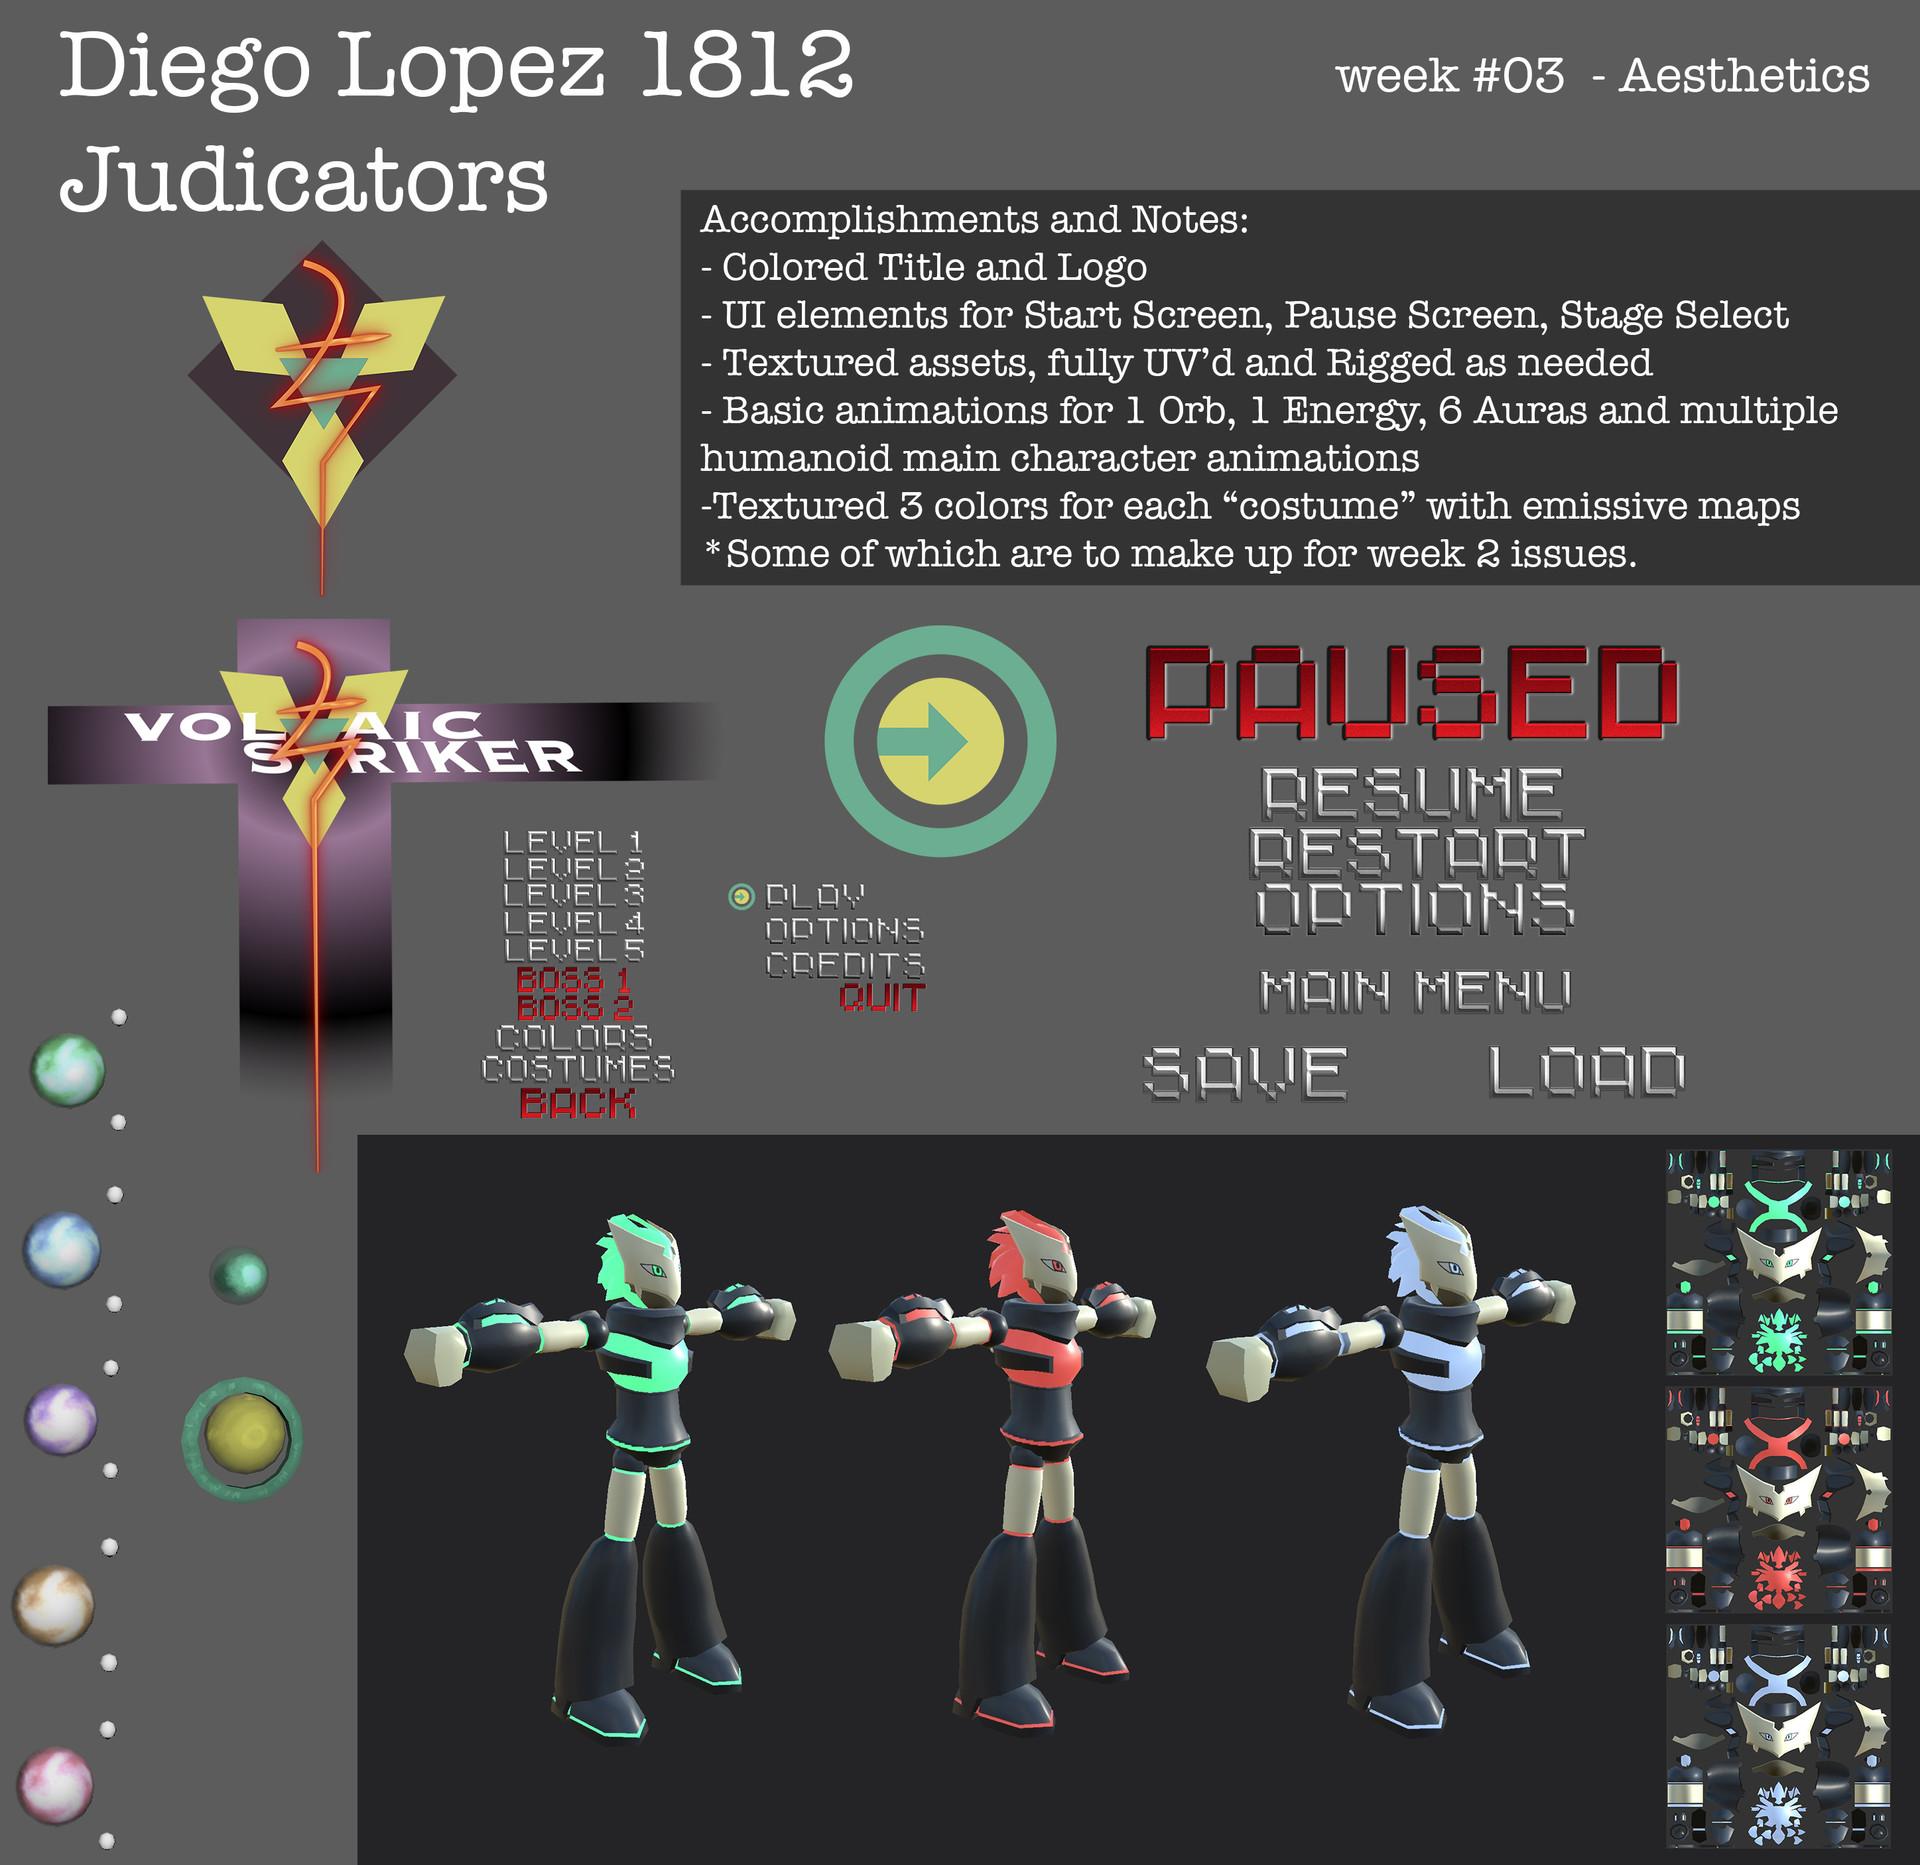 Diego sebastian reid lopez lopezd 1812 judicators wk3